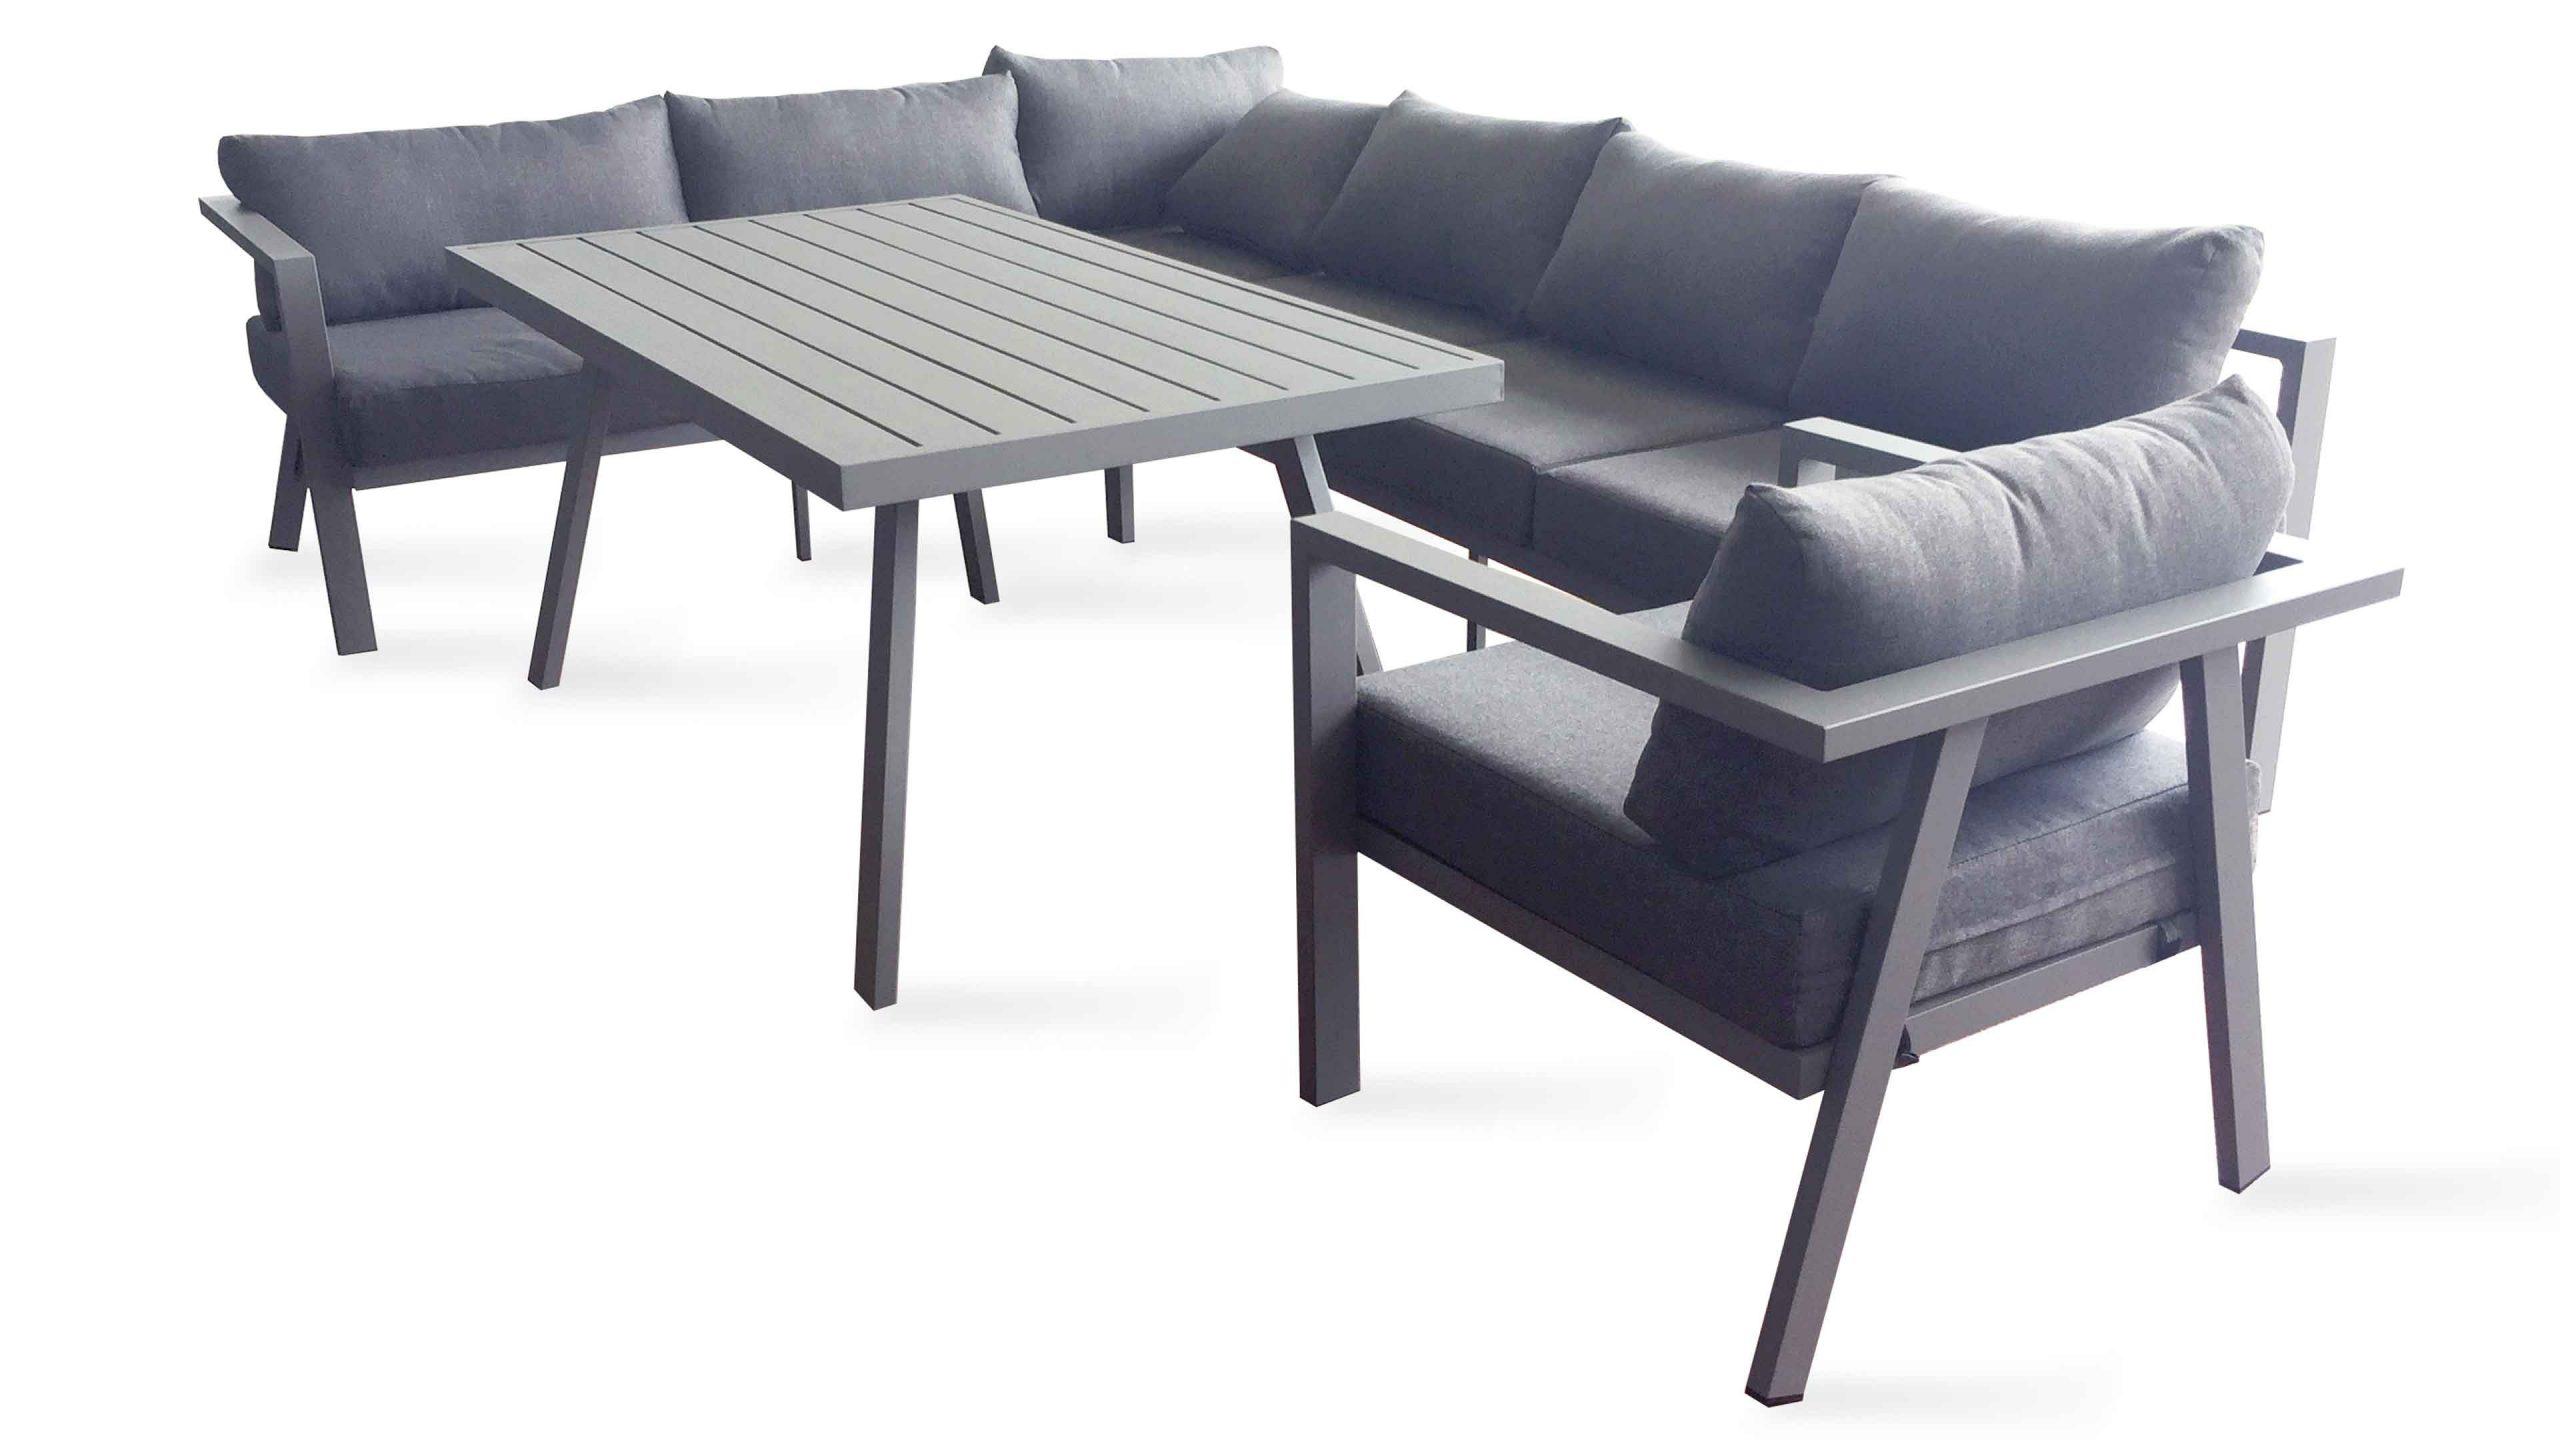 Salon De Jardin Angle Aluminium - The Best Undercut Ponytail concernant Canapé D Angle De Jardin